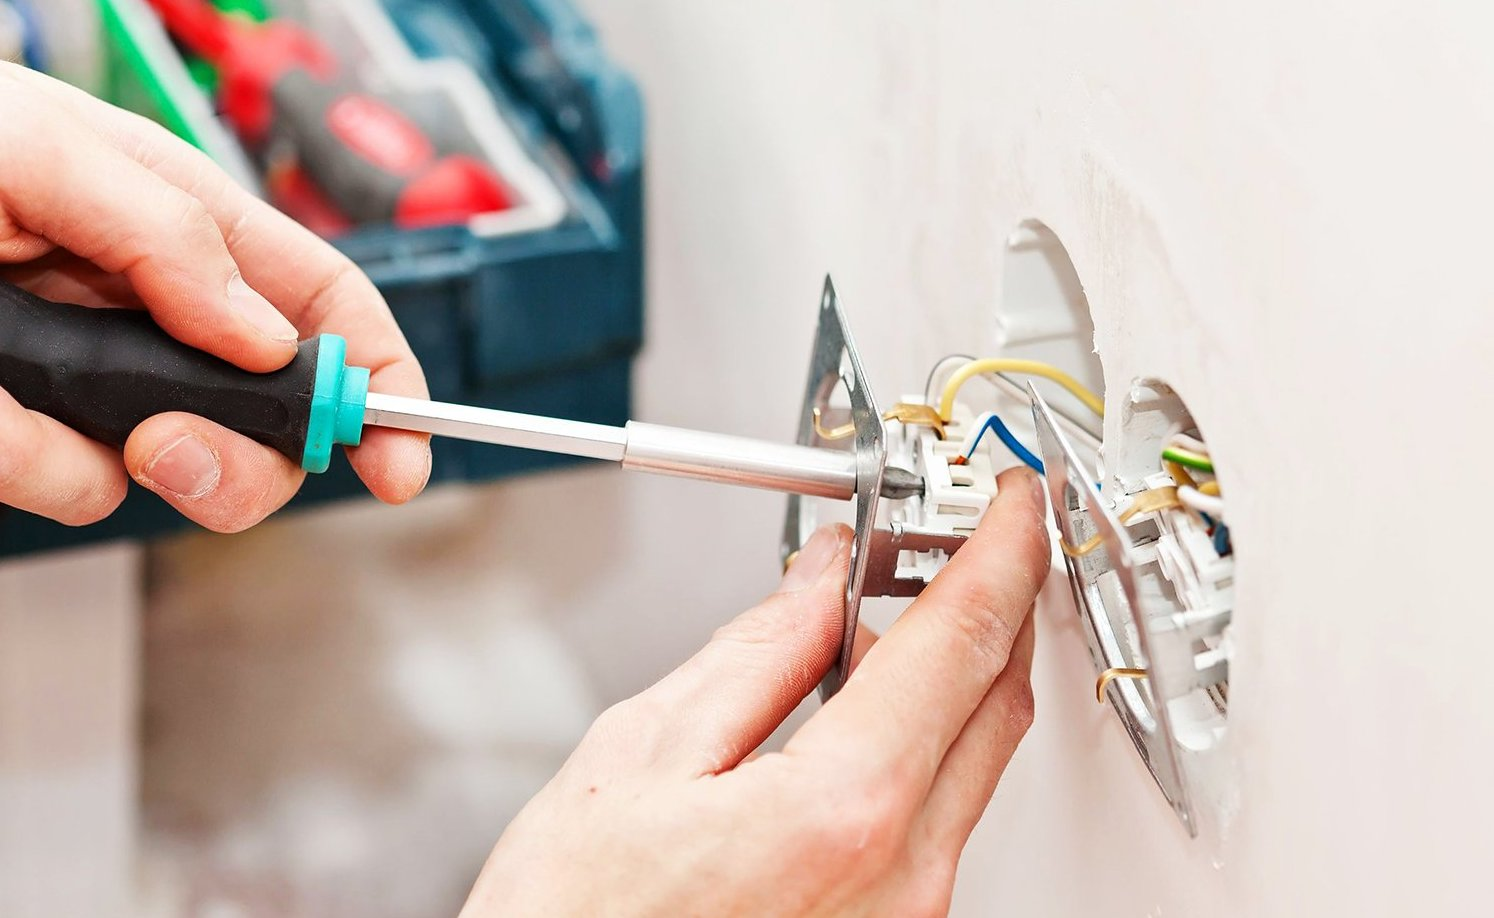 Монтаж электропроводки в контексте услуги «ремонт под ключ»